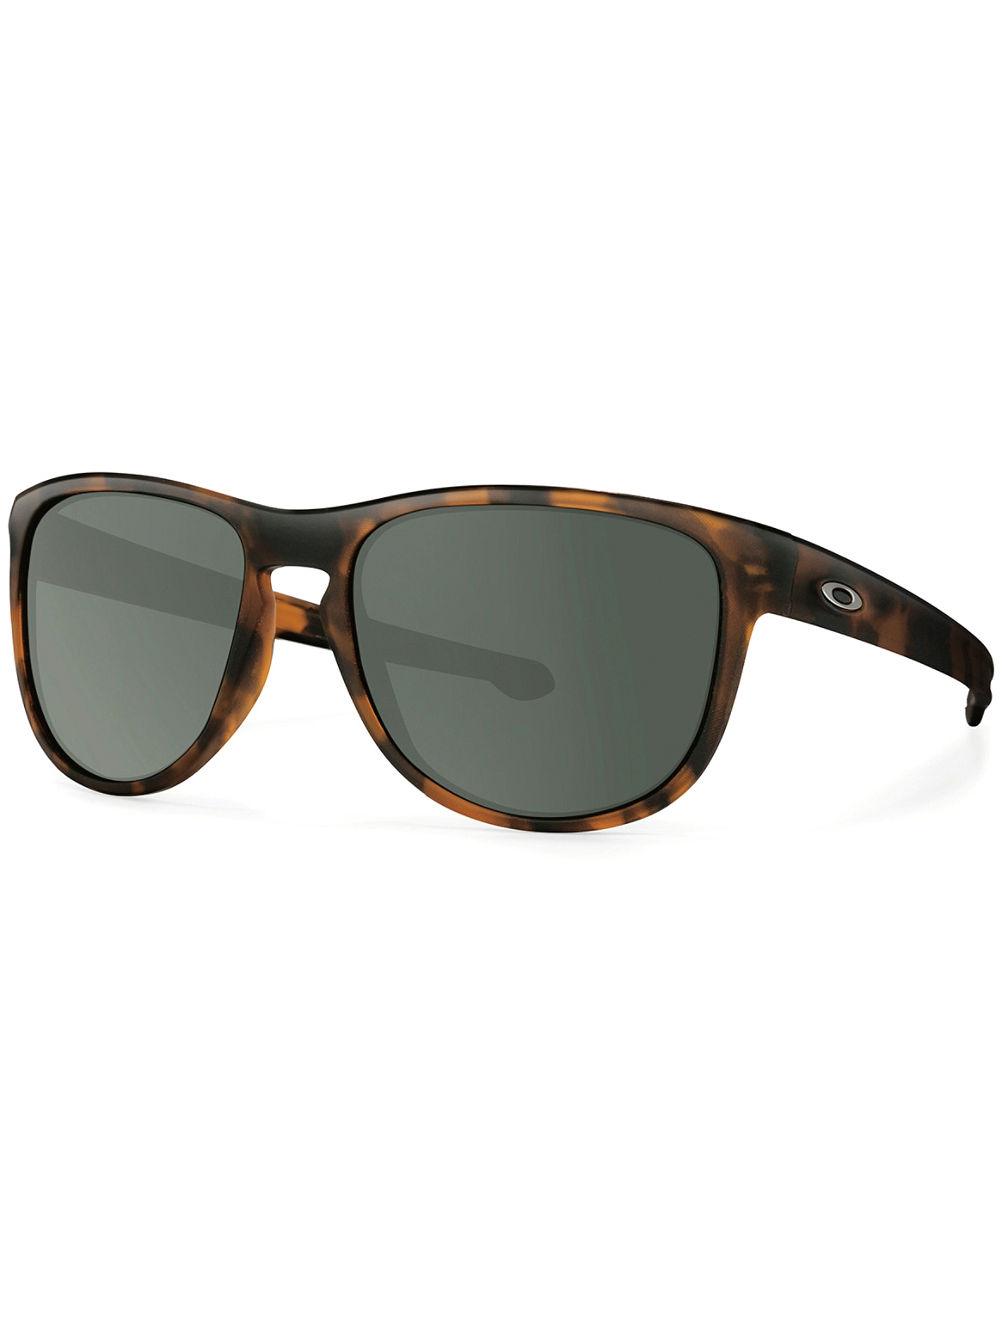 a10222681ab5b Buy Oakley Sliver R Brown Tortoise online at blue-tomato.com